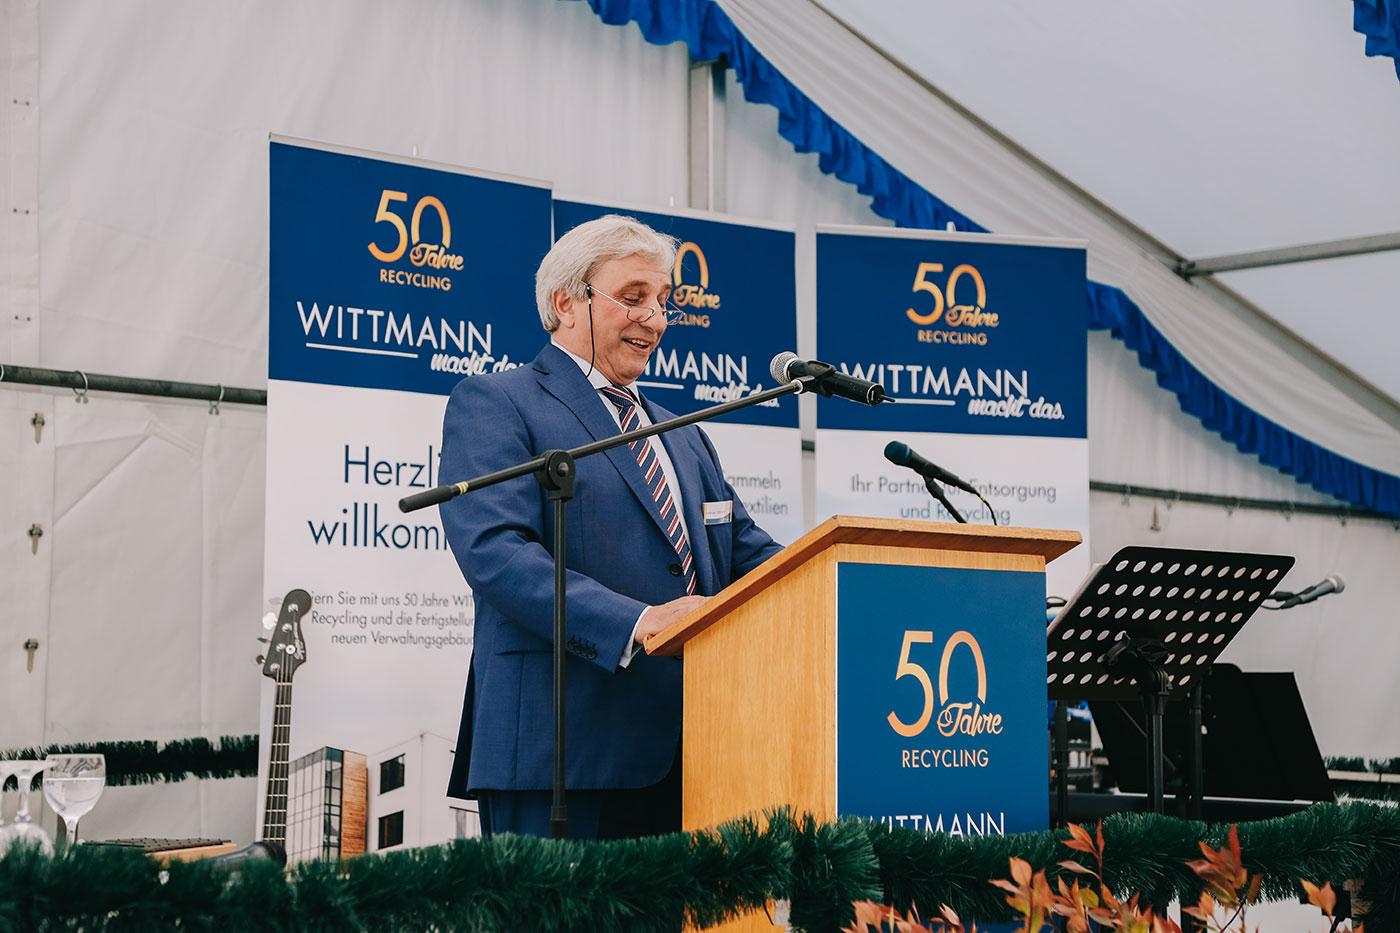 Andreas Wittmann hält eine Rede auf der Wittmann Recycling Jubiläumsfeier